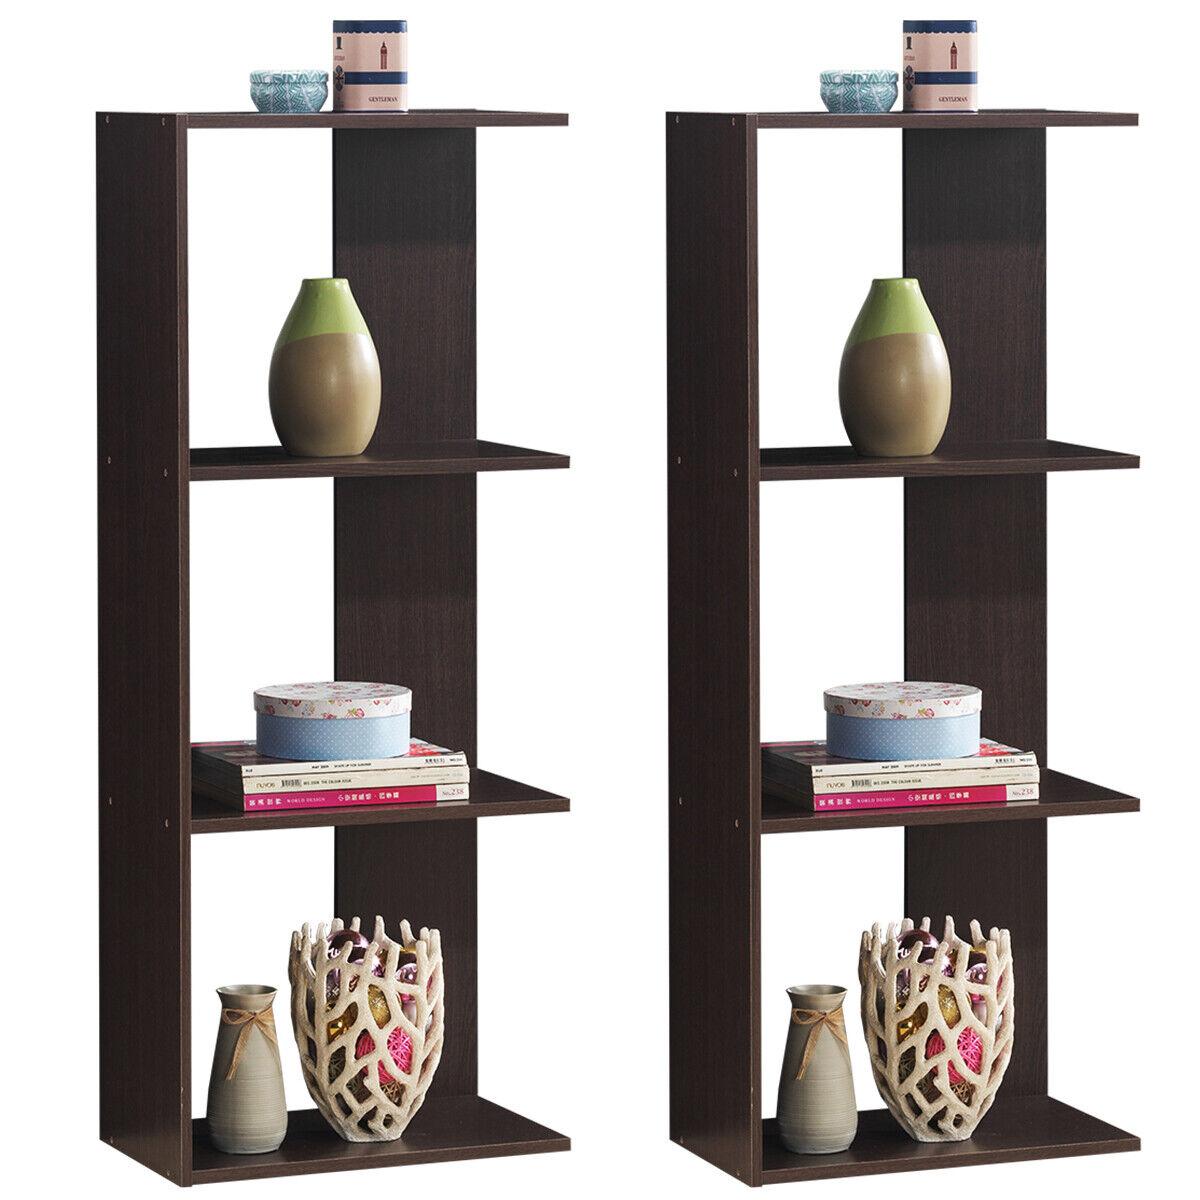 2 Pcs Bookcase Storage 3 Tier Open Shelf Display Living Room Divider Modern